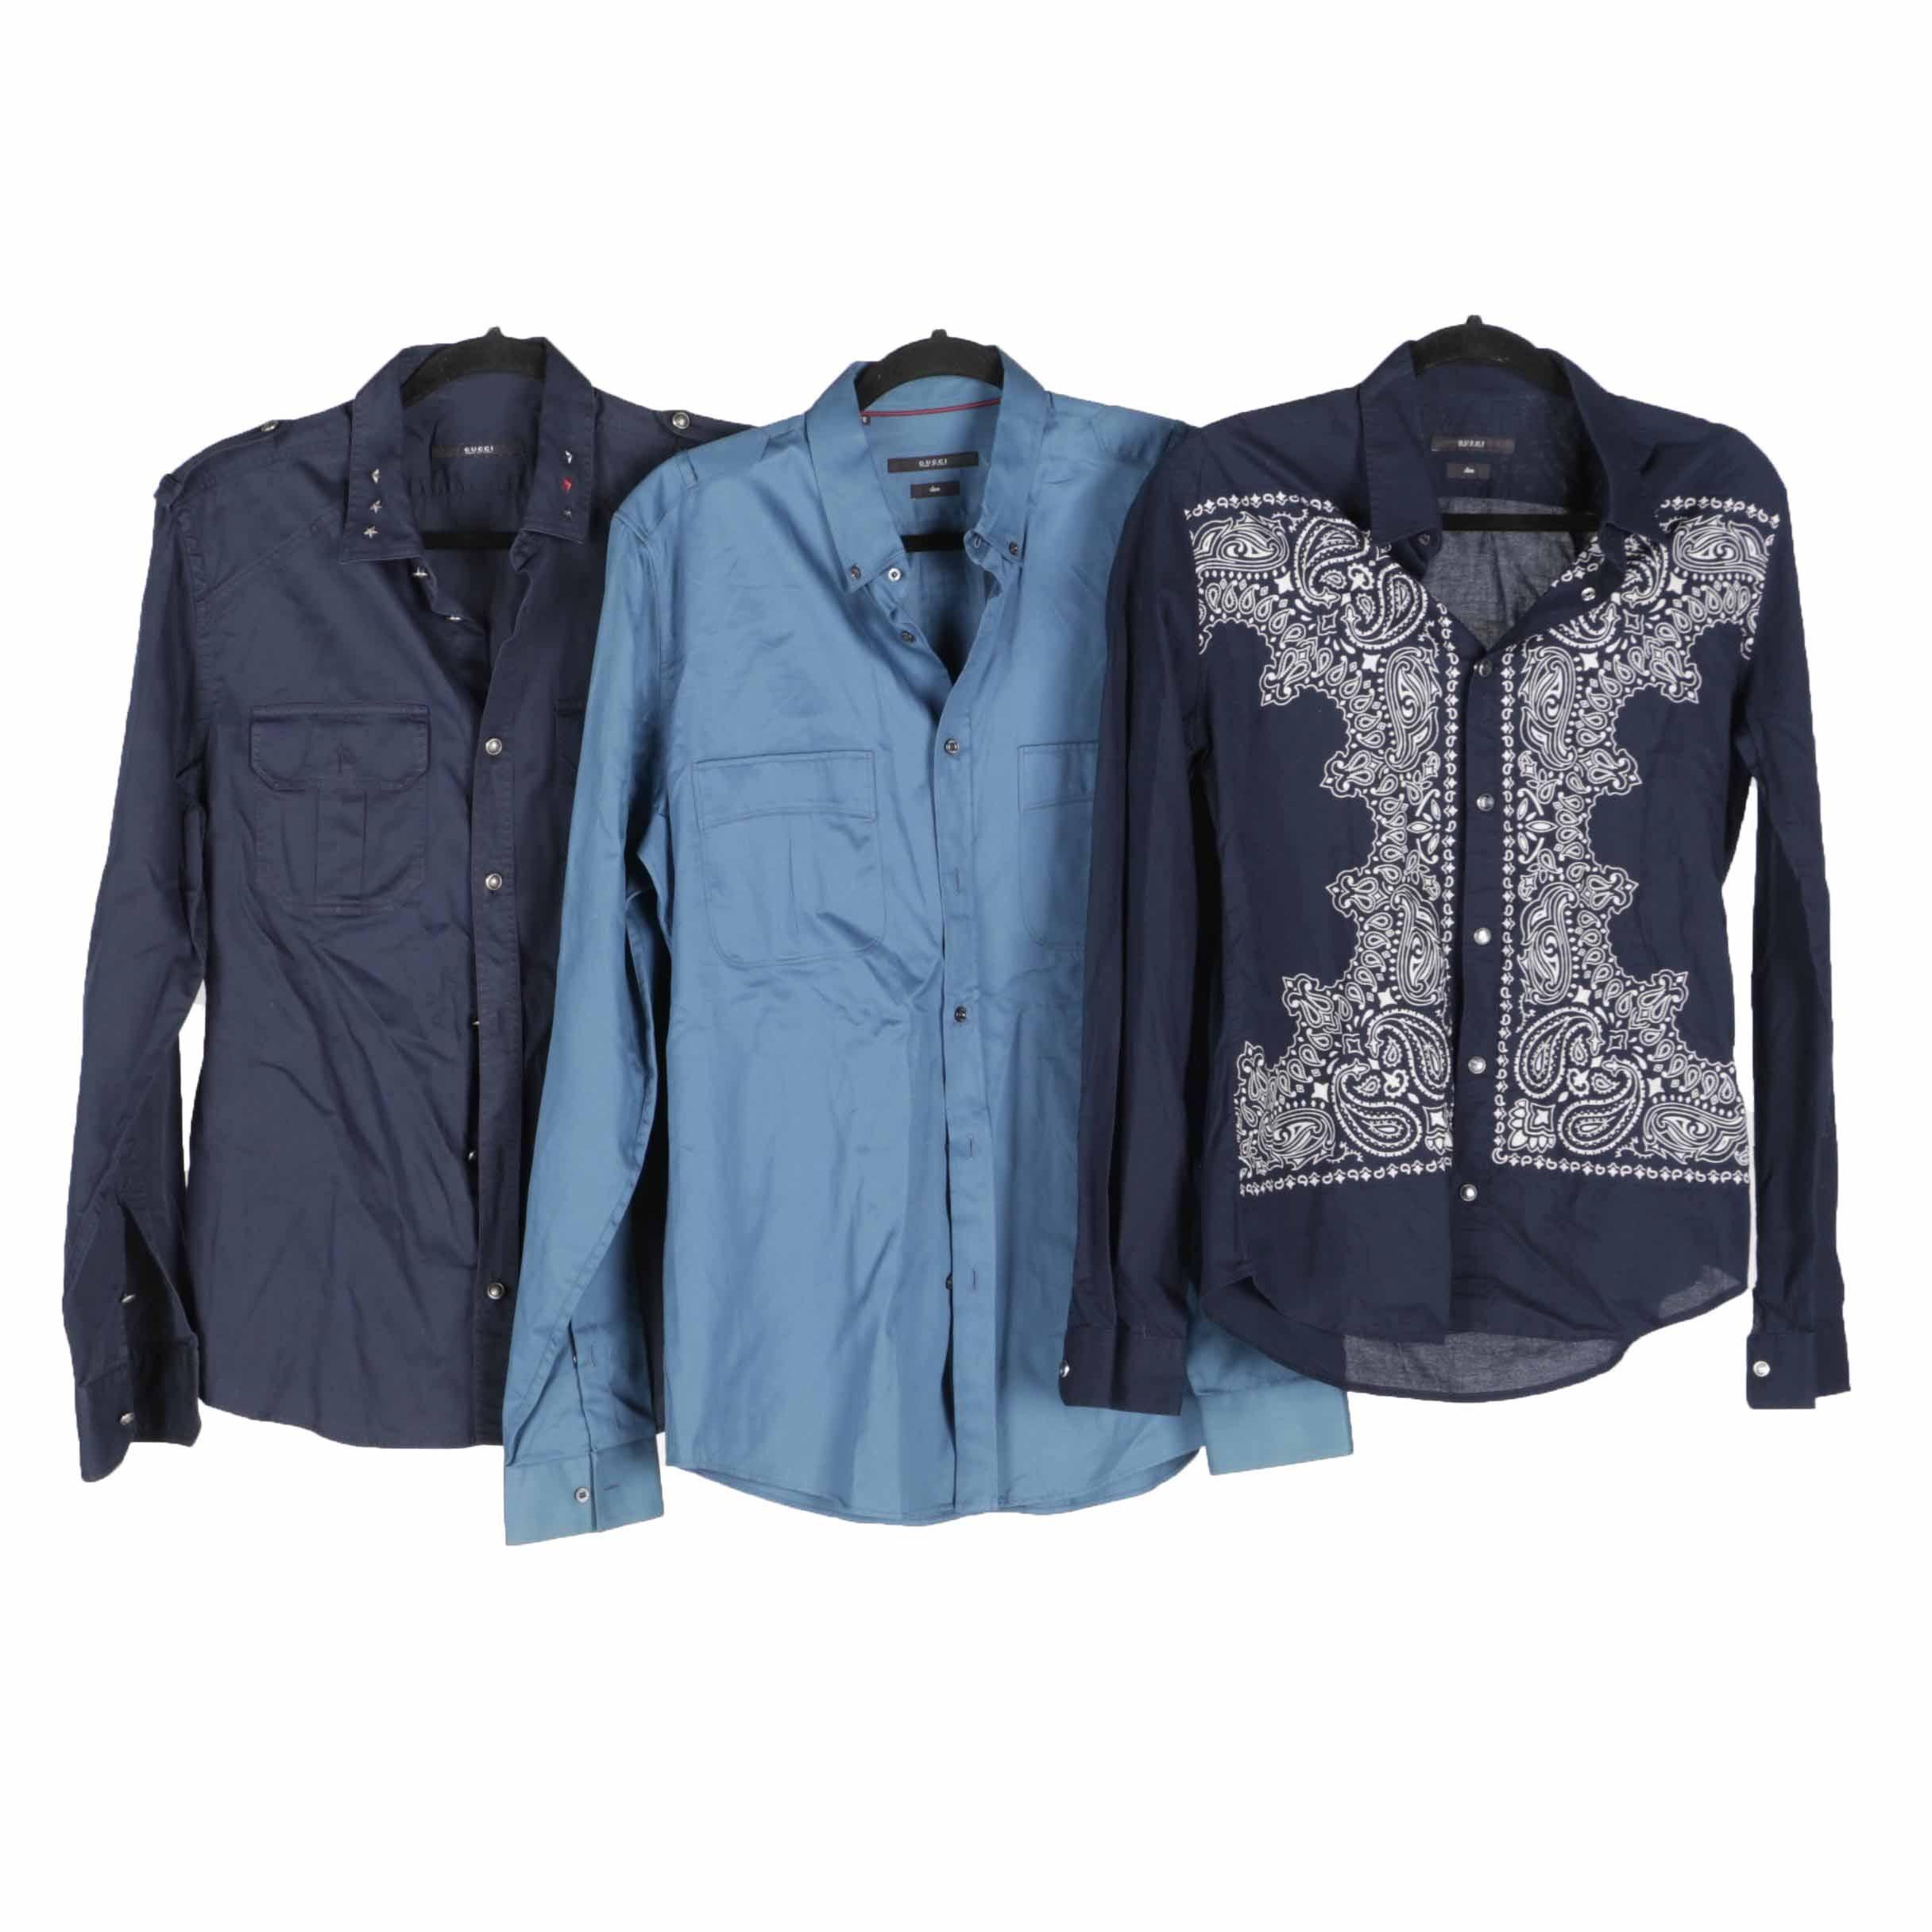 Men's Gucci Button Button Down Shirts